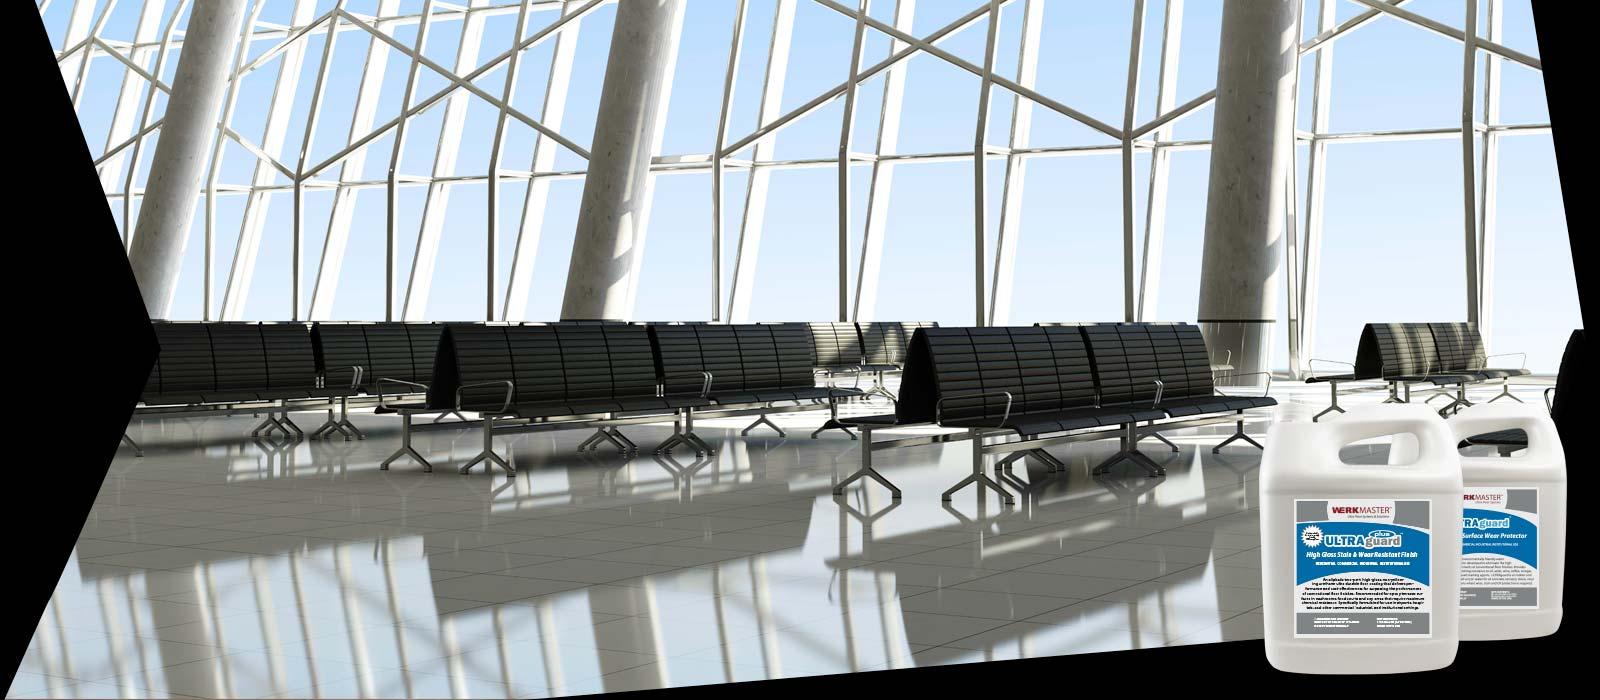 WerkMaster Airport ULTRAguard